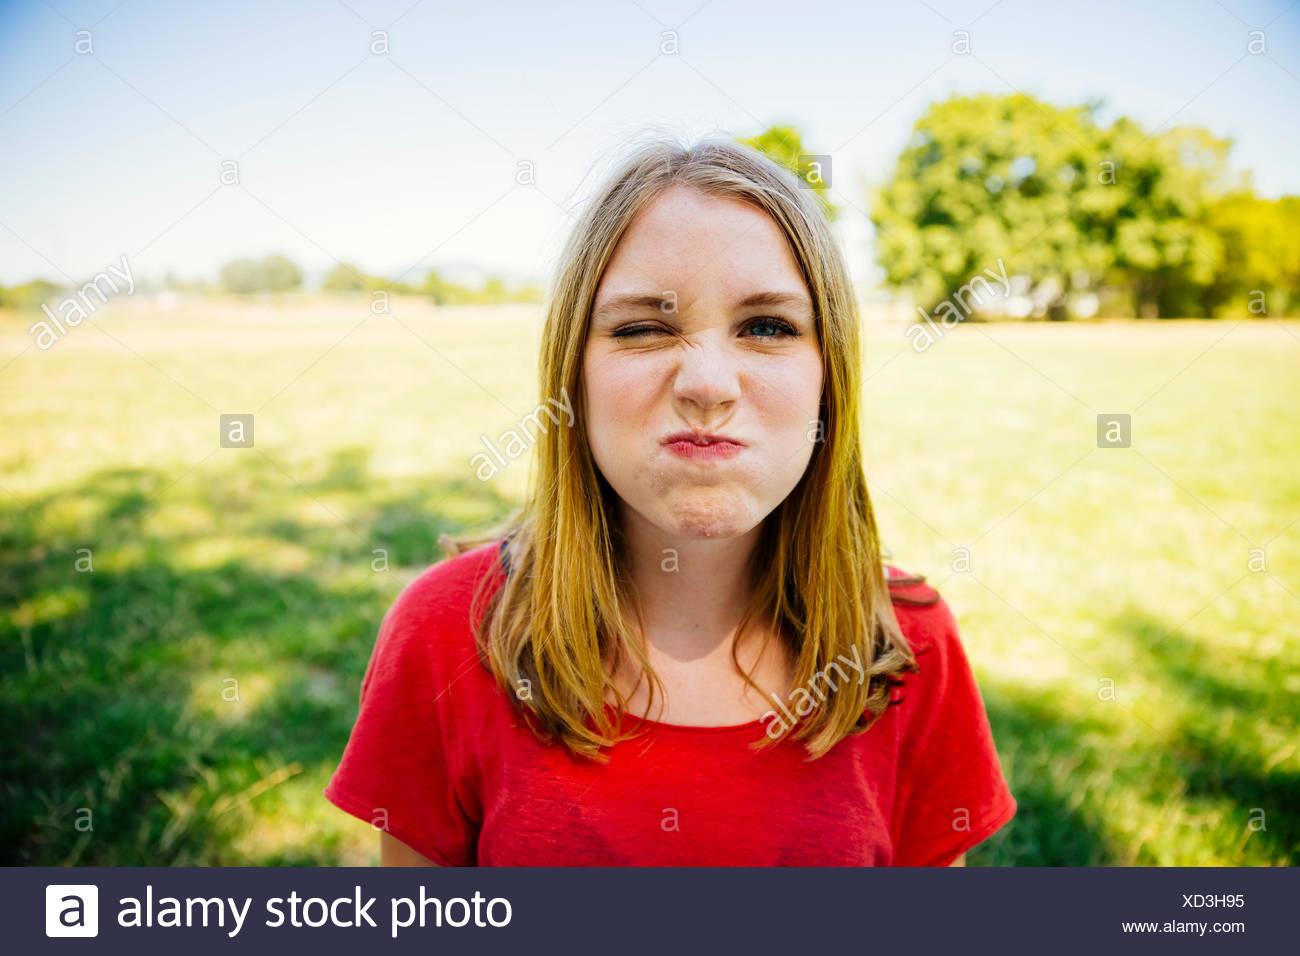 Portrait of teenage girl outdoors grimacing - Stock Image